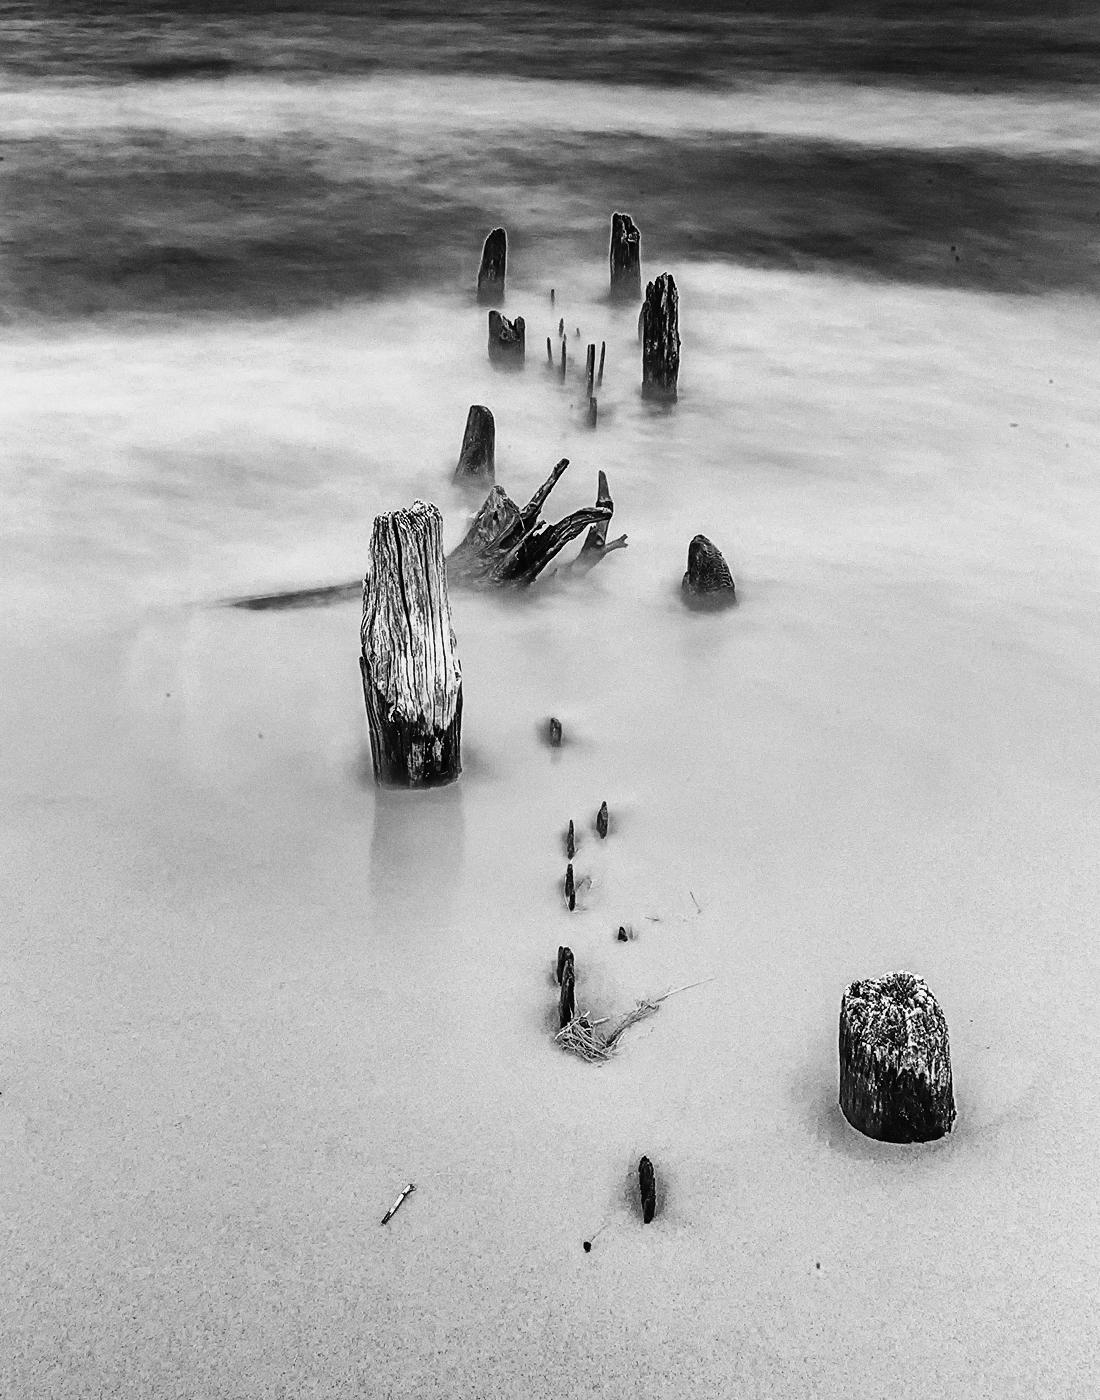 Abandon Piers In Lake Michigan